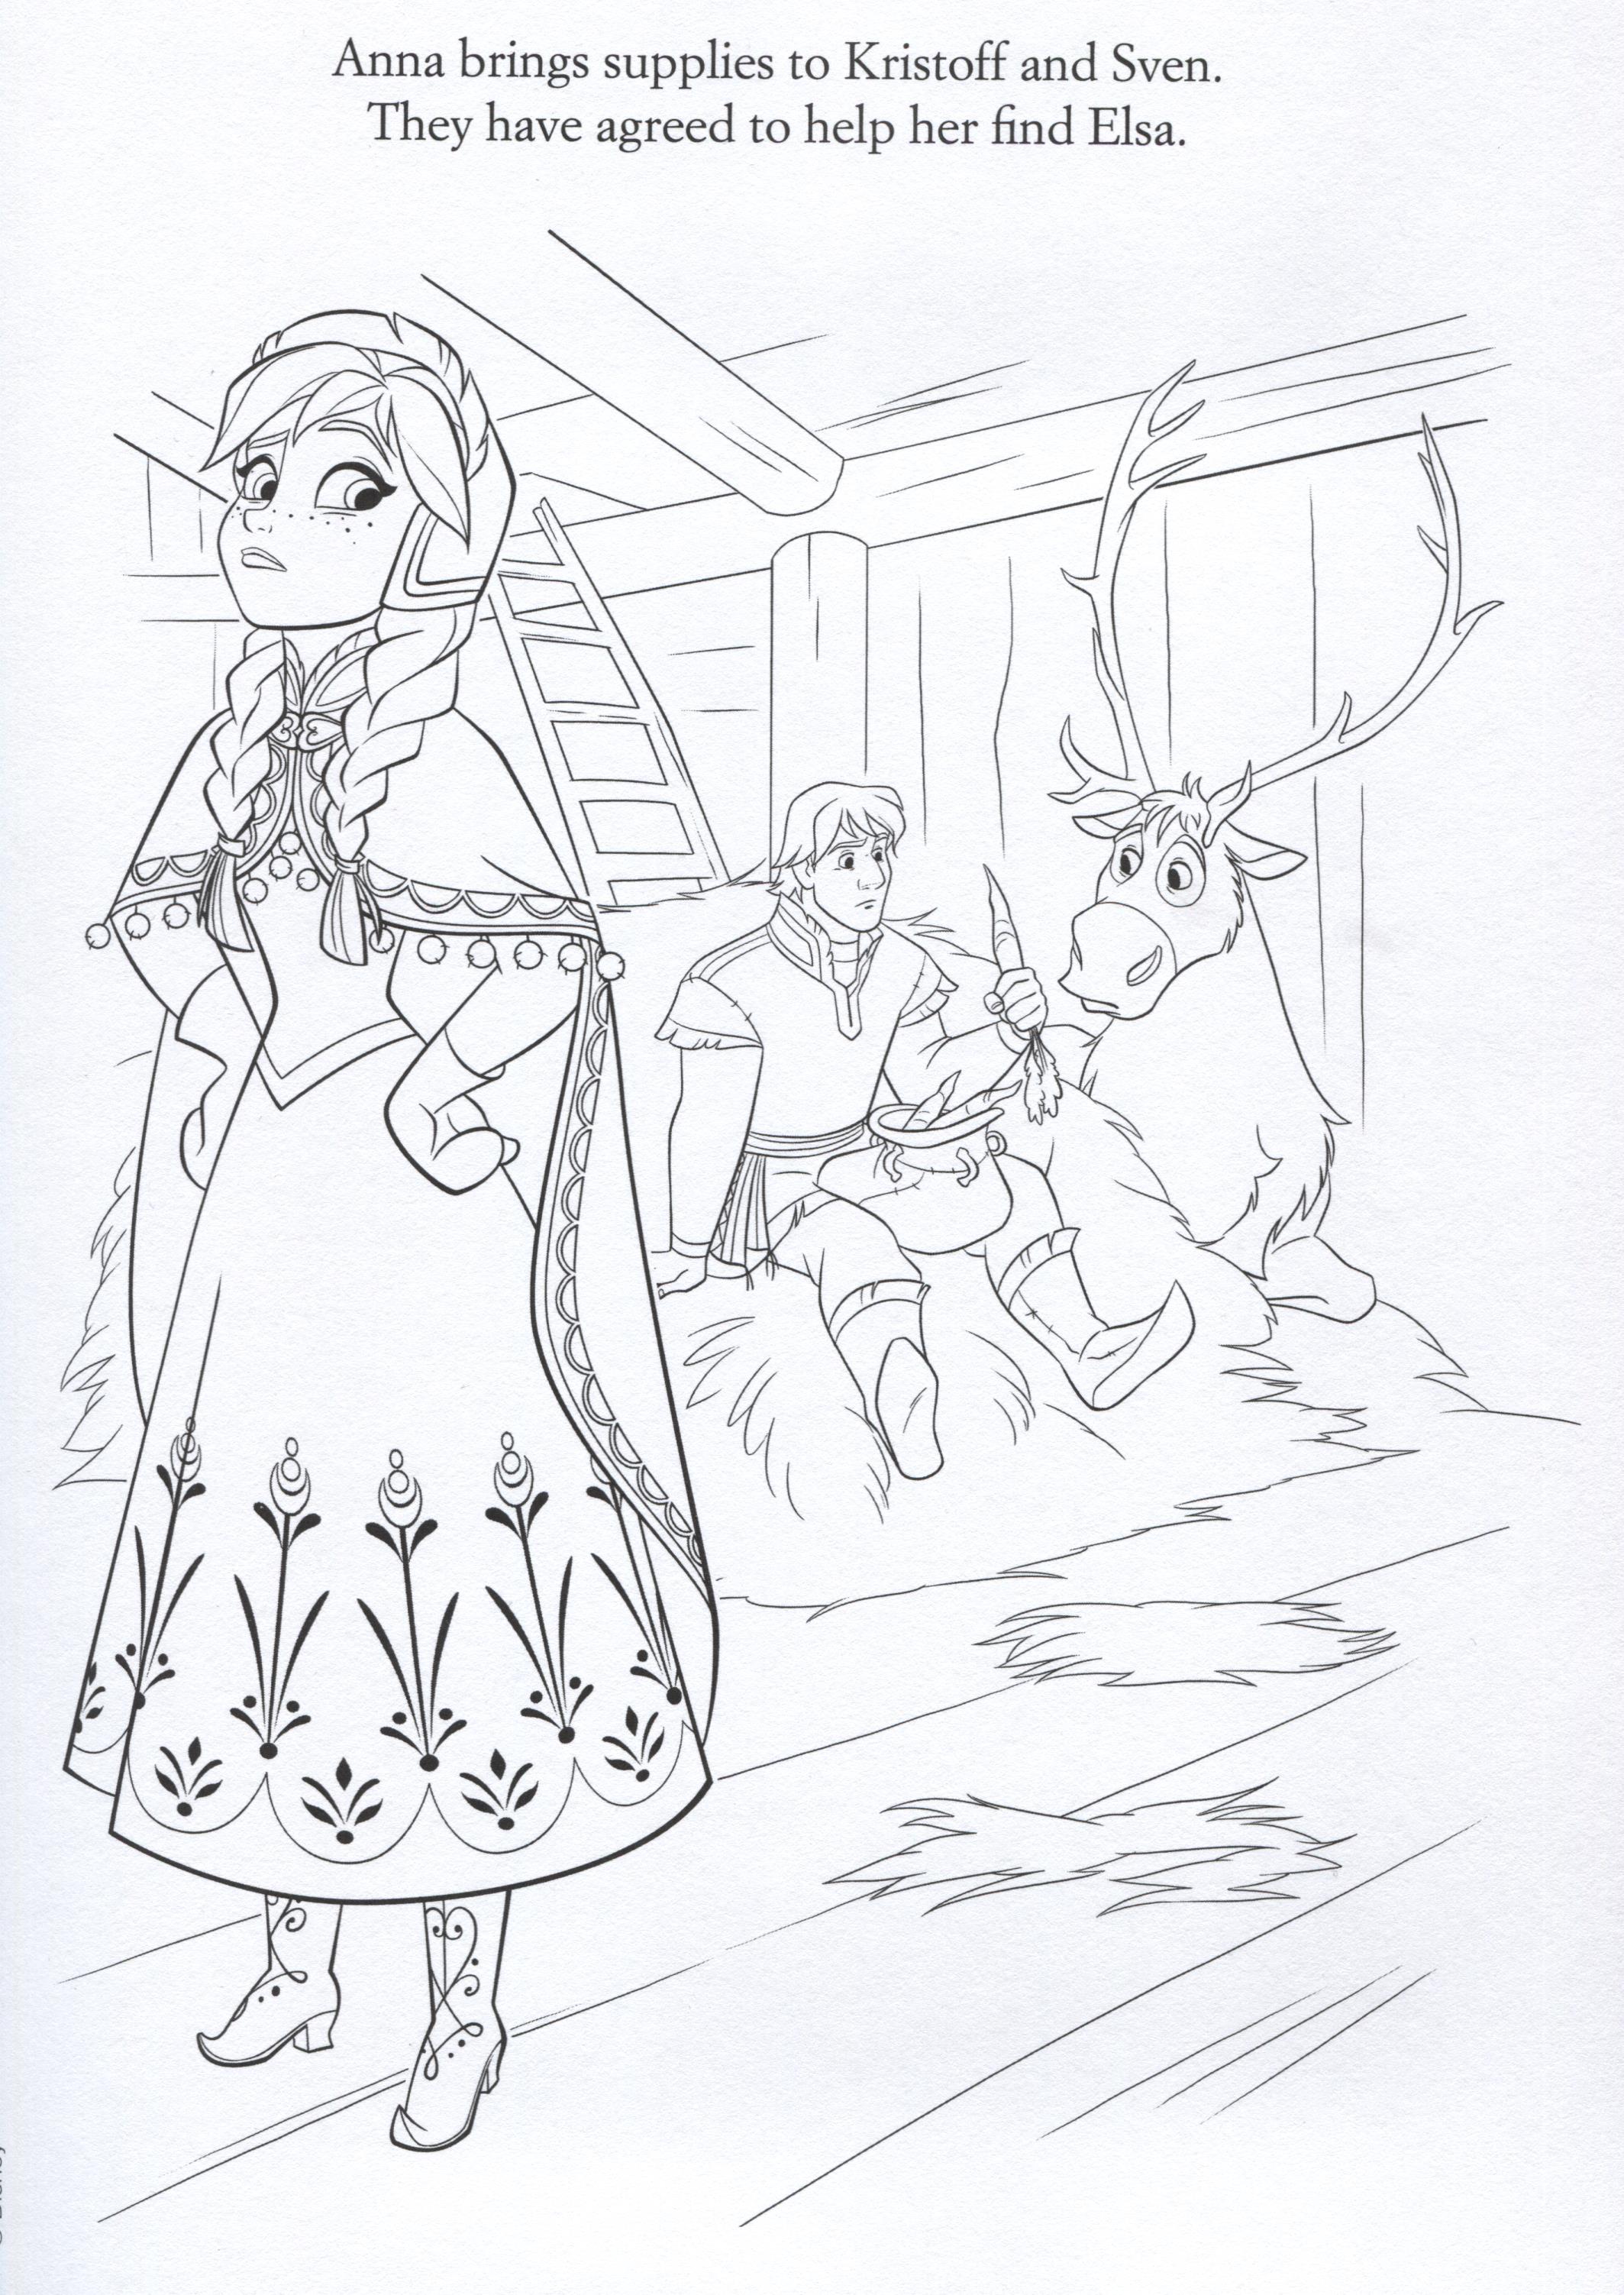 Frozen coloring pages let it go - Raskraski Kholodnoe Serdtse 20